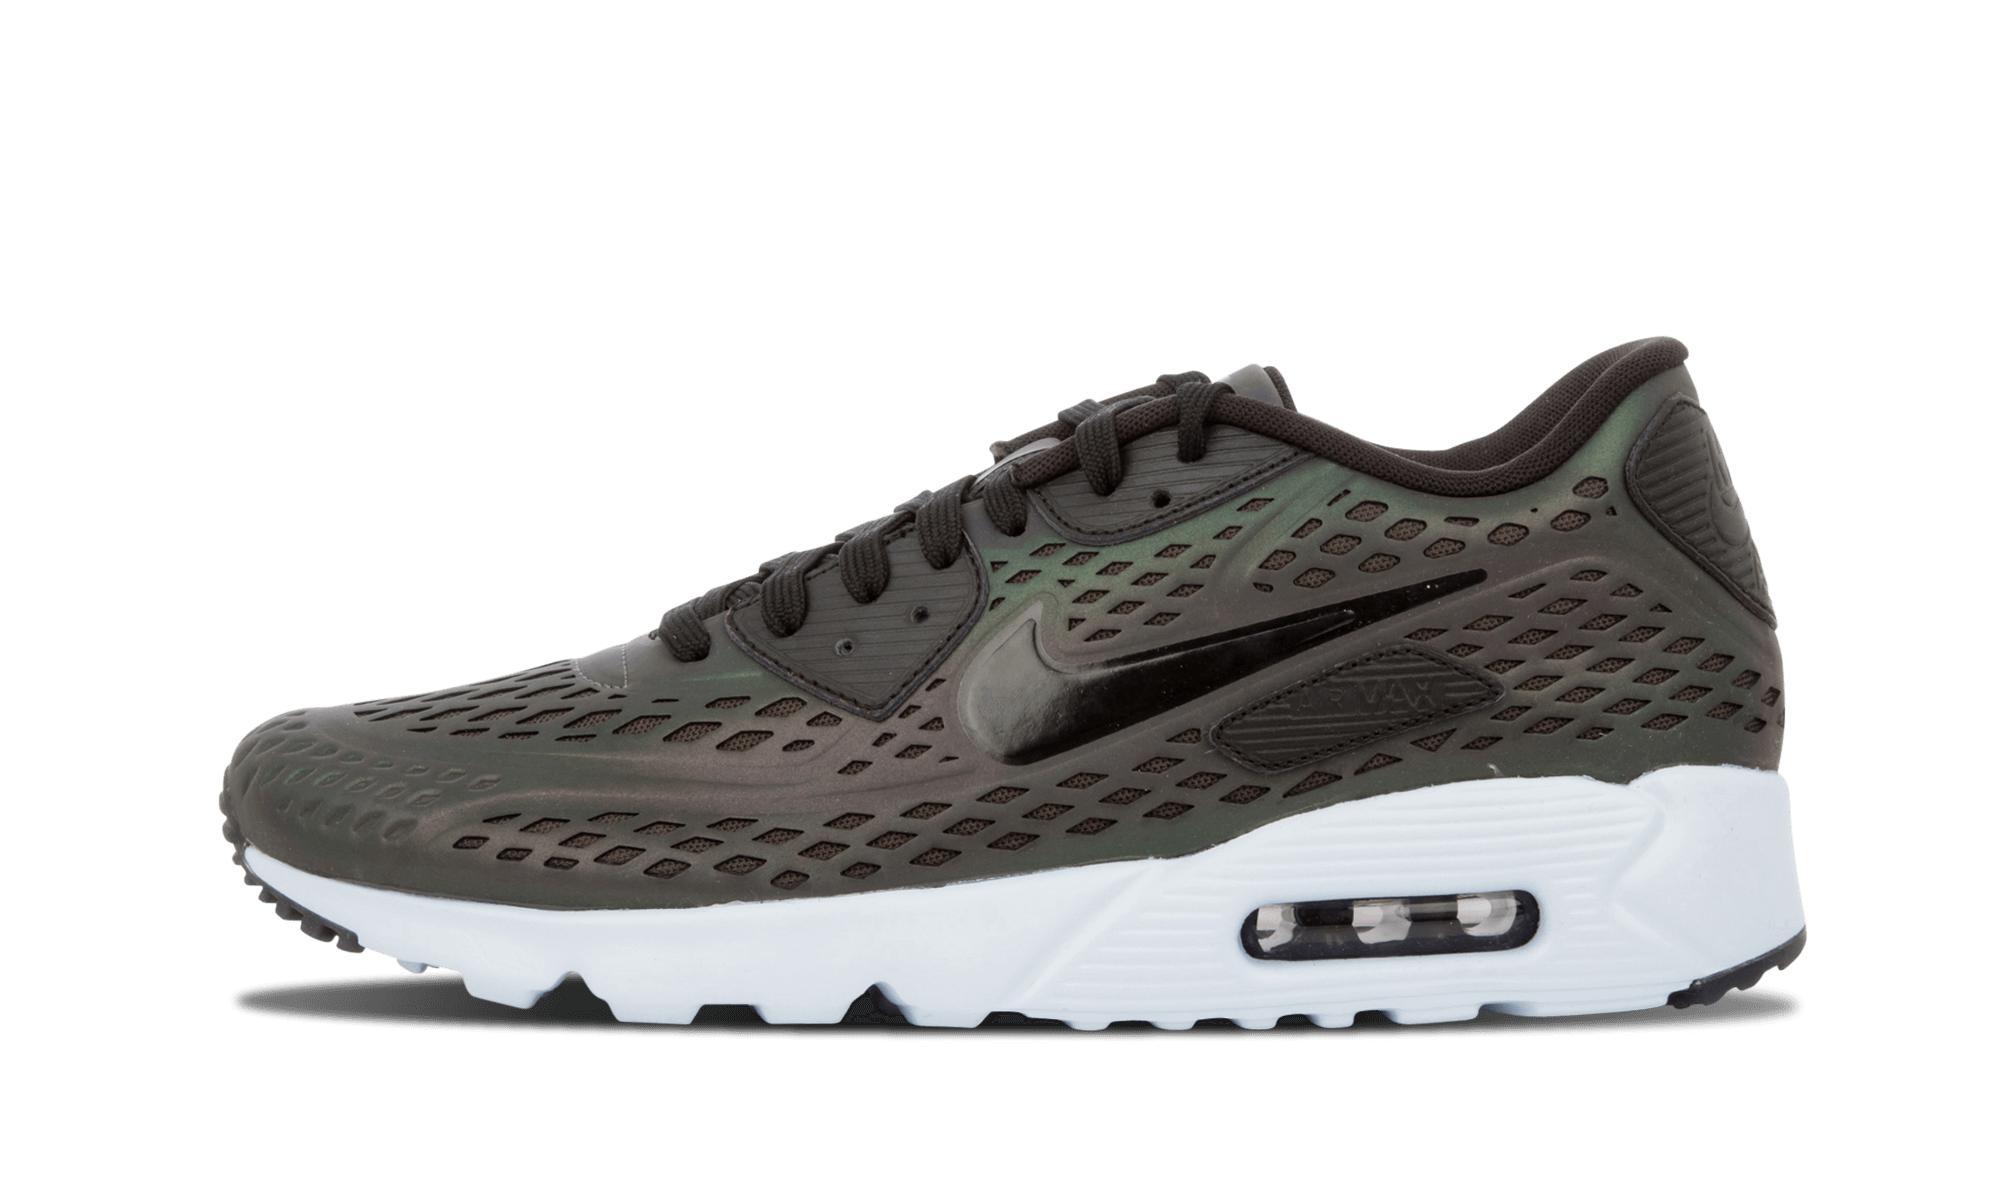 low priced 32a4b 4caf6 Nike. Men s Air Max 90 Ultra Moire Qs